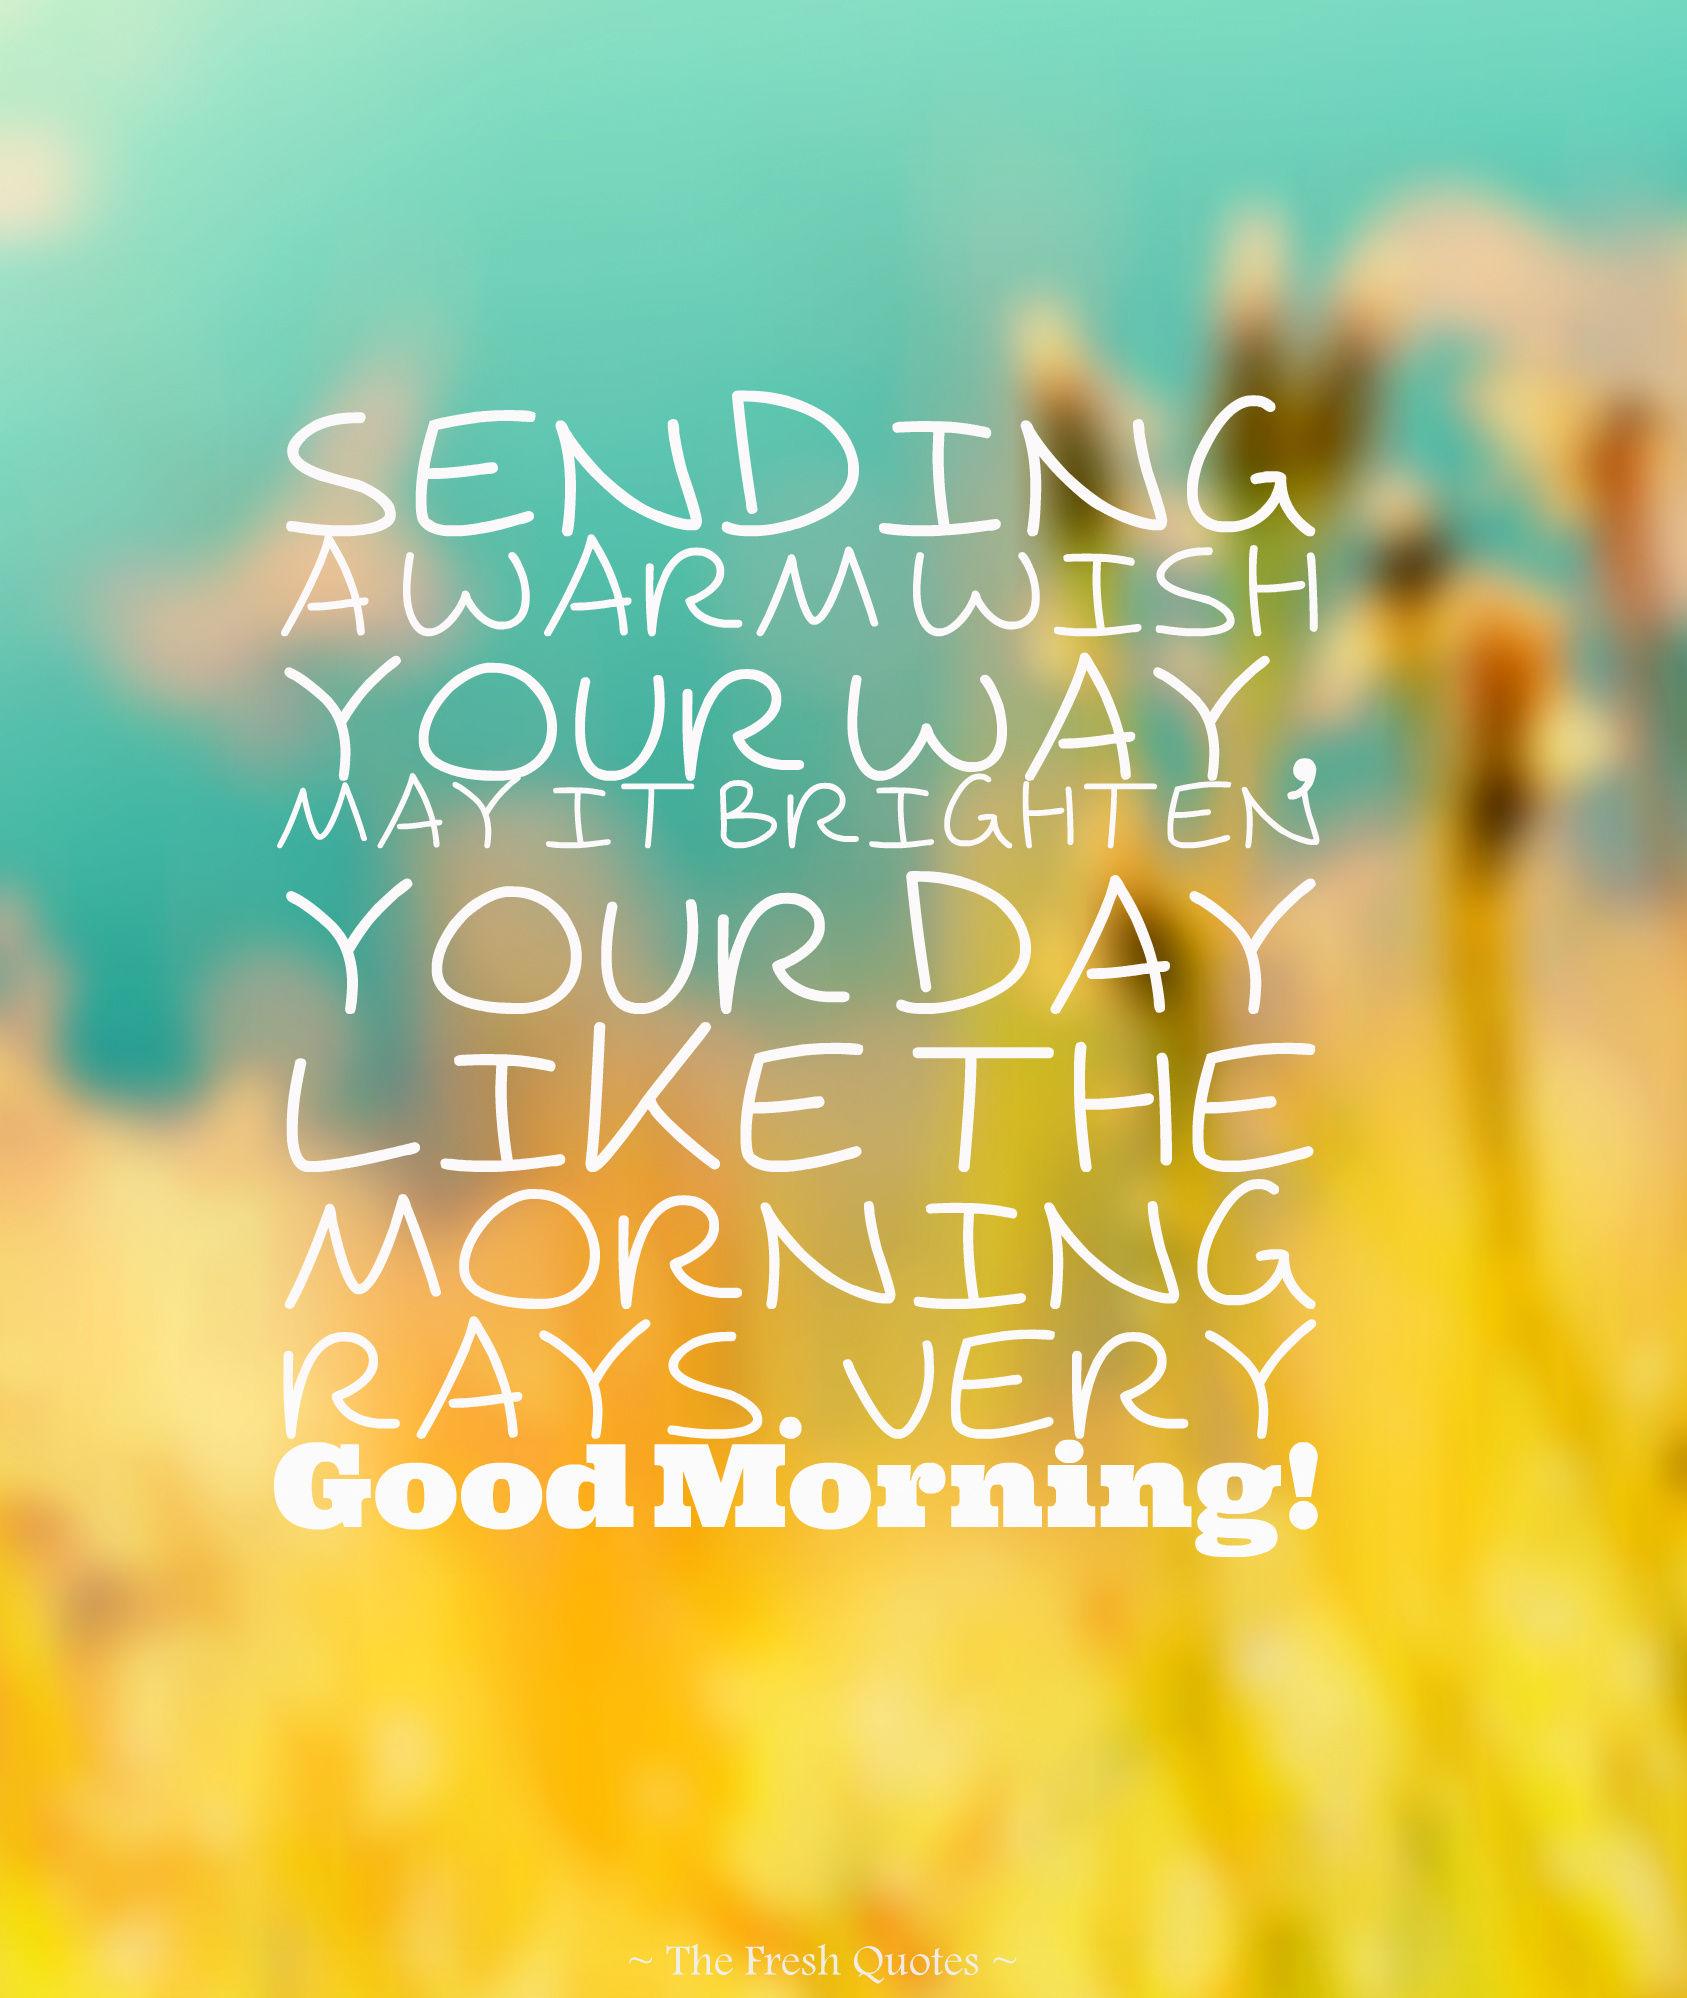 Sending a warm wish your way good morning pictures photos and sending a warm wish your way good morning m4hsunfo